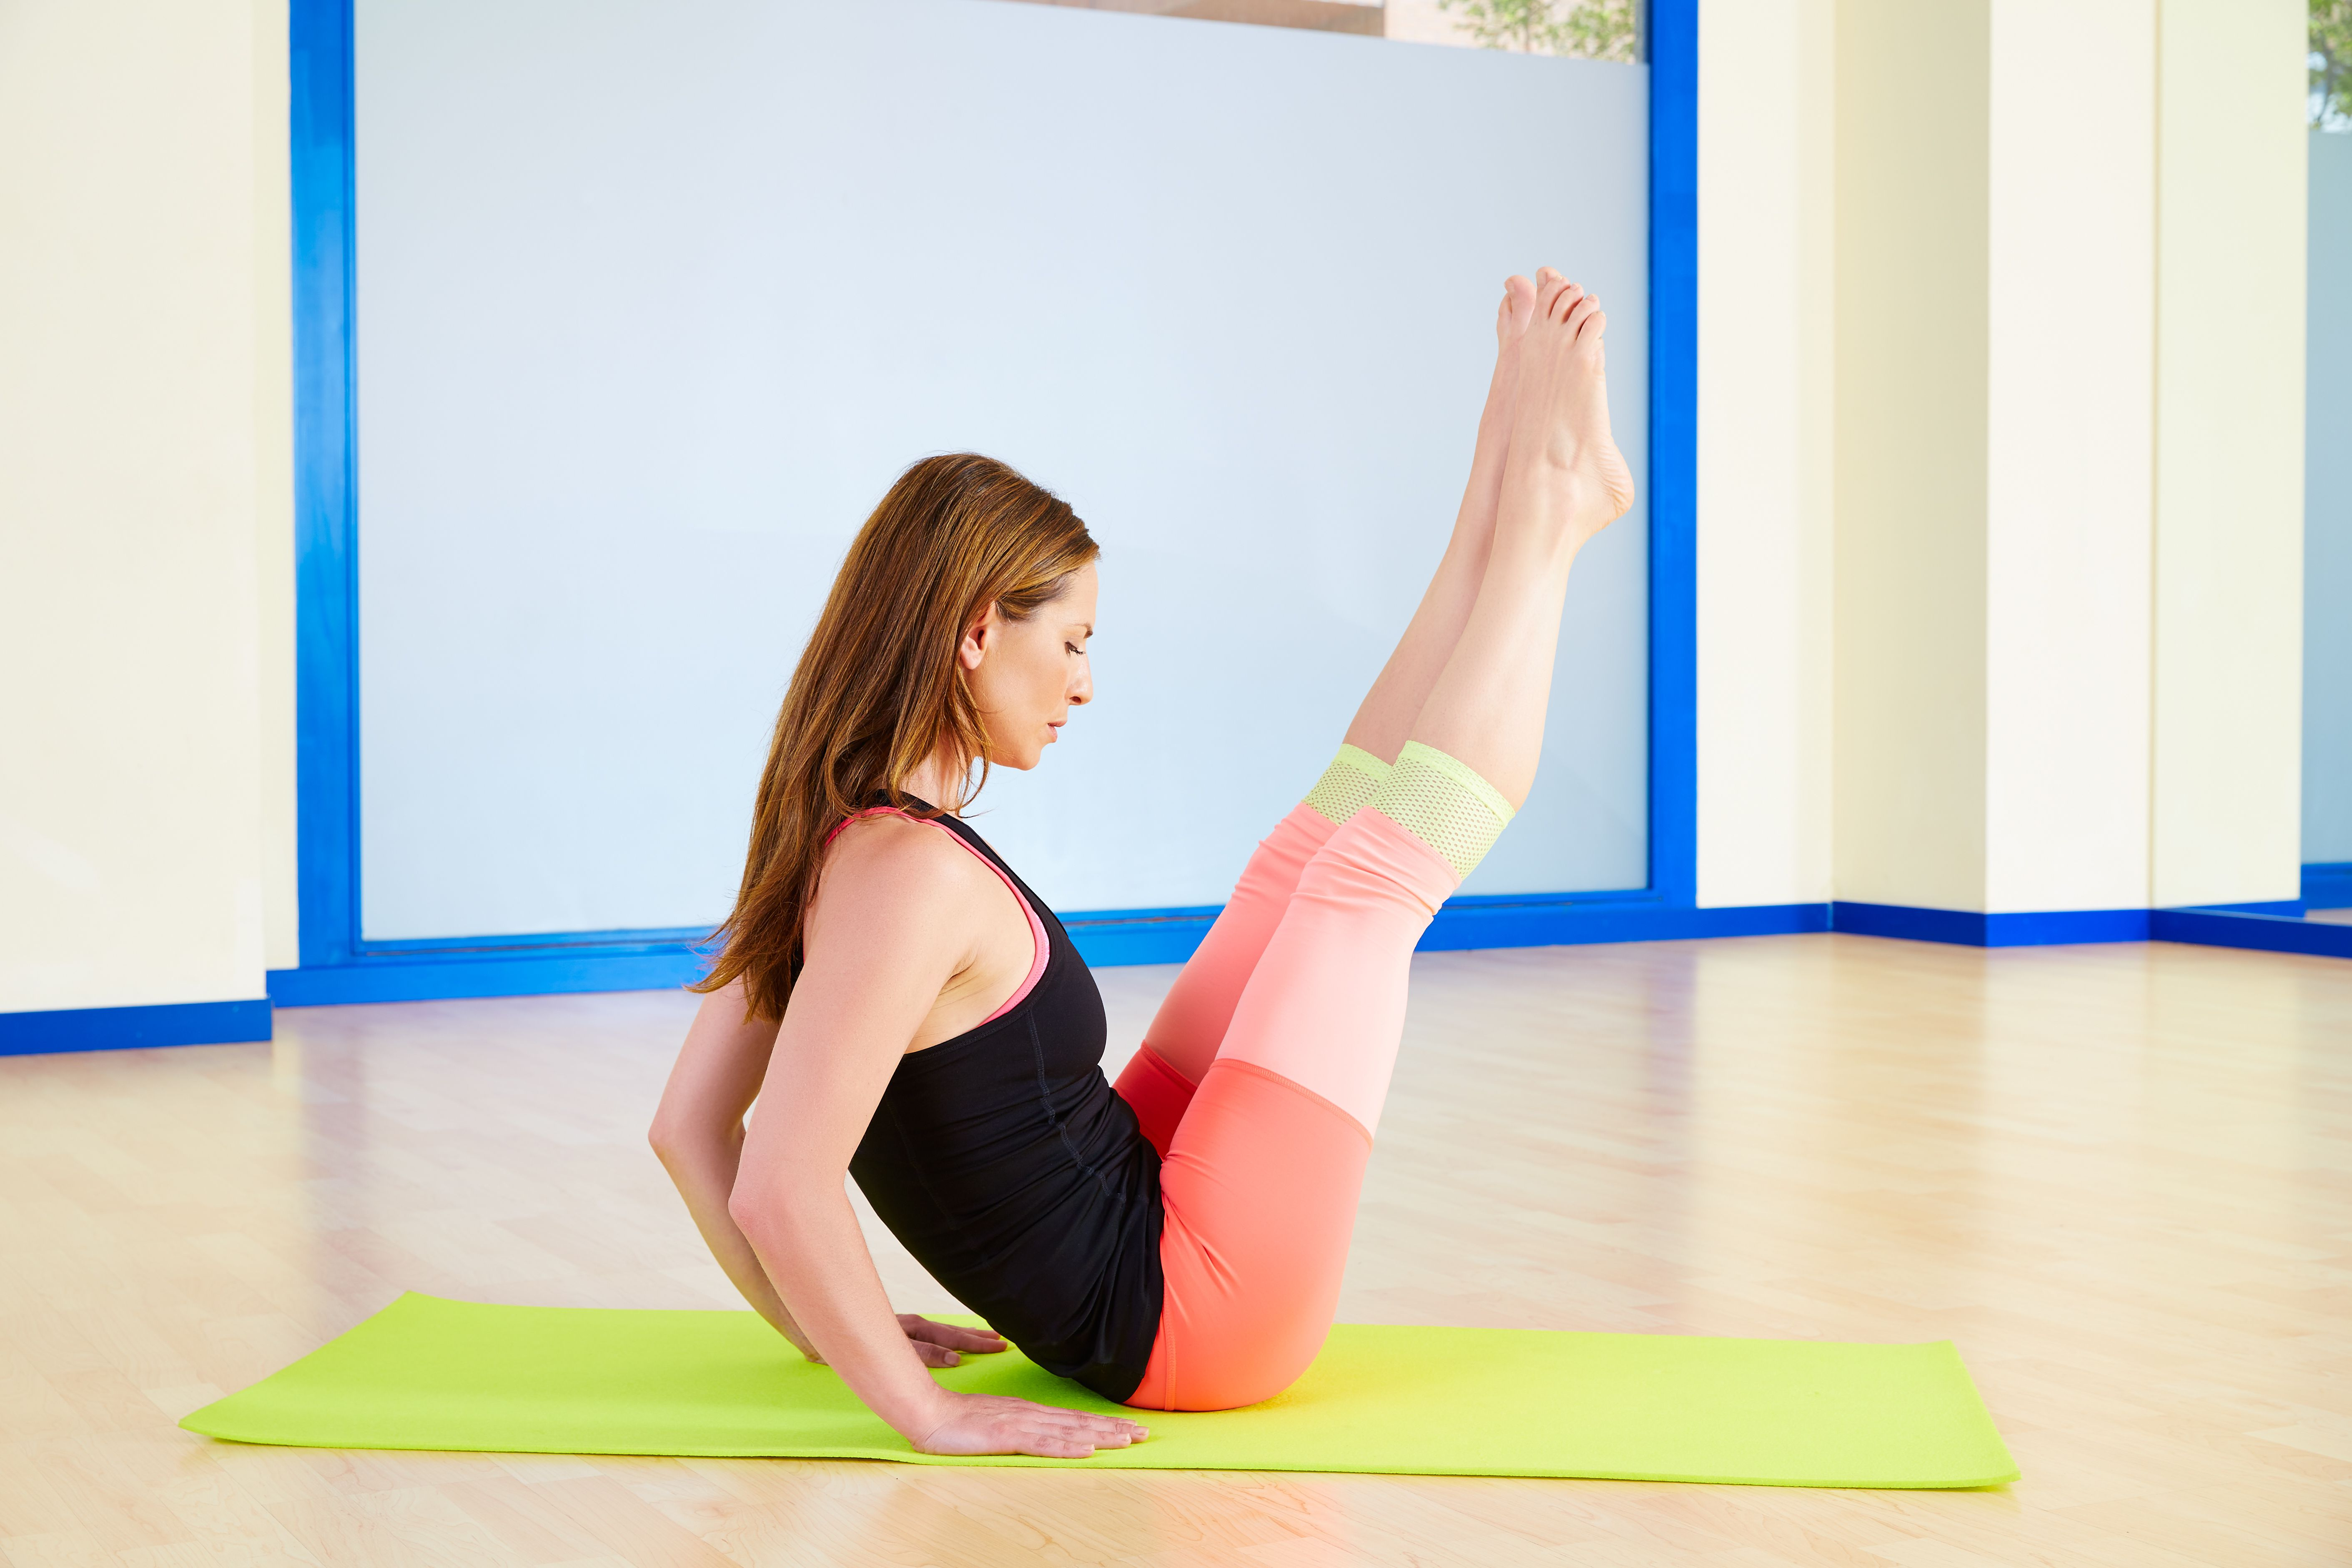 Advanced Pilates Exercises on the Mat